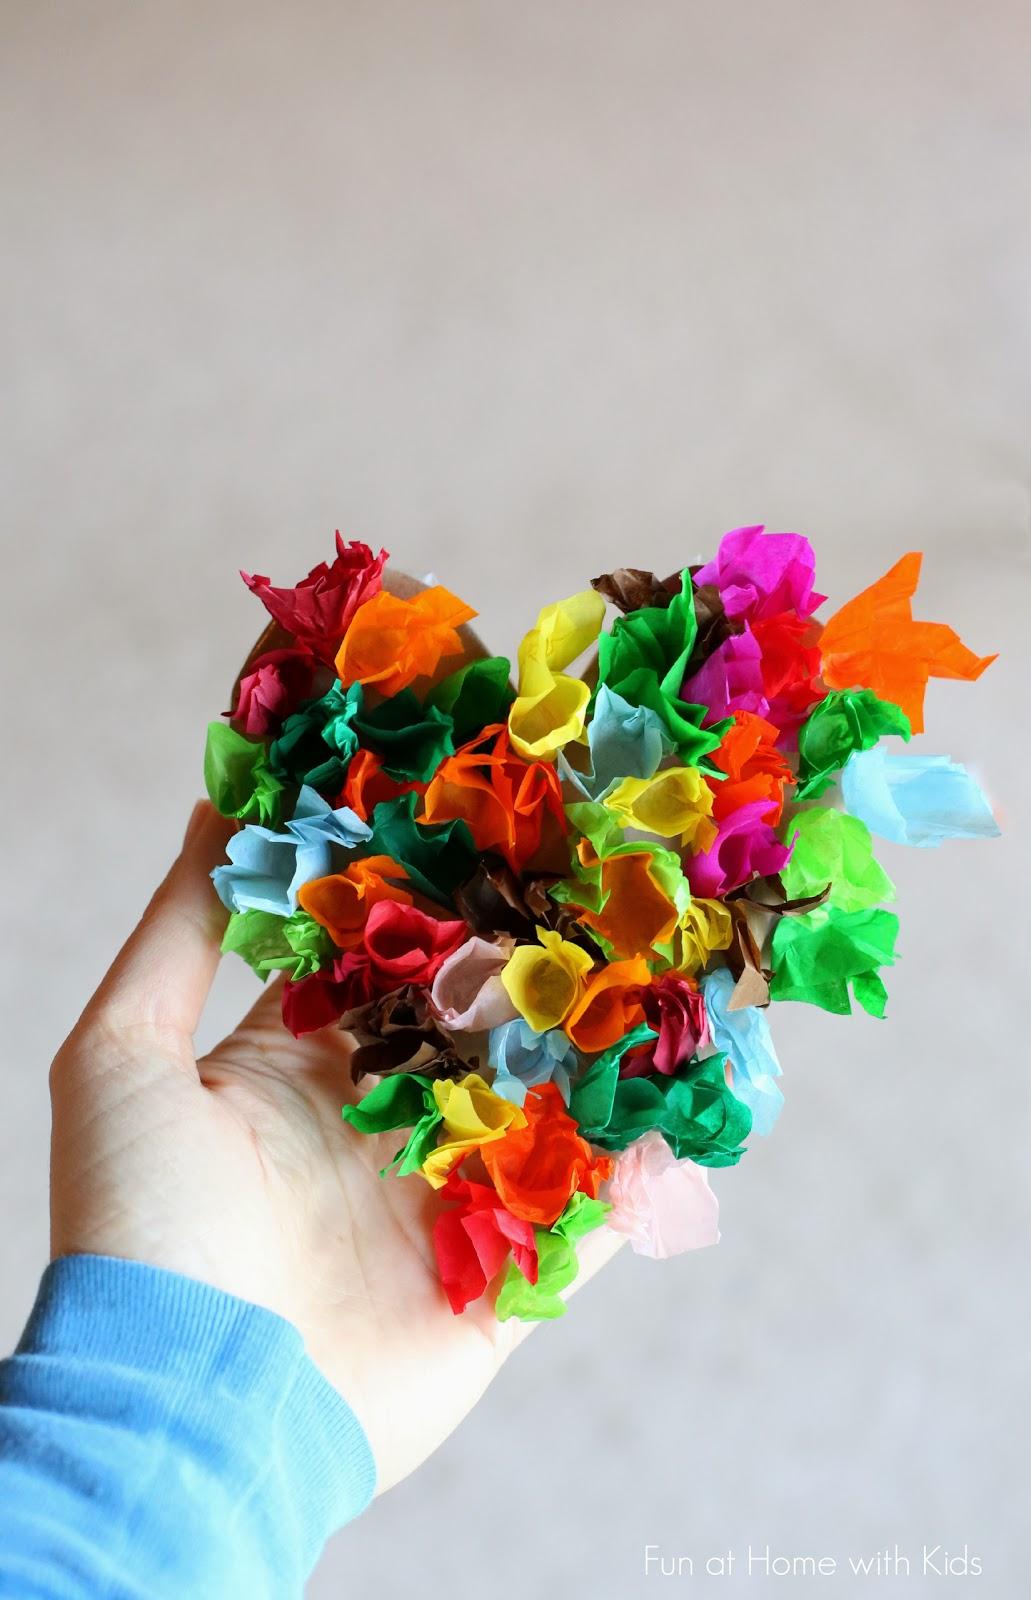 25 Adorable Heart Shaped Craft Ideas For Preschool